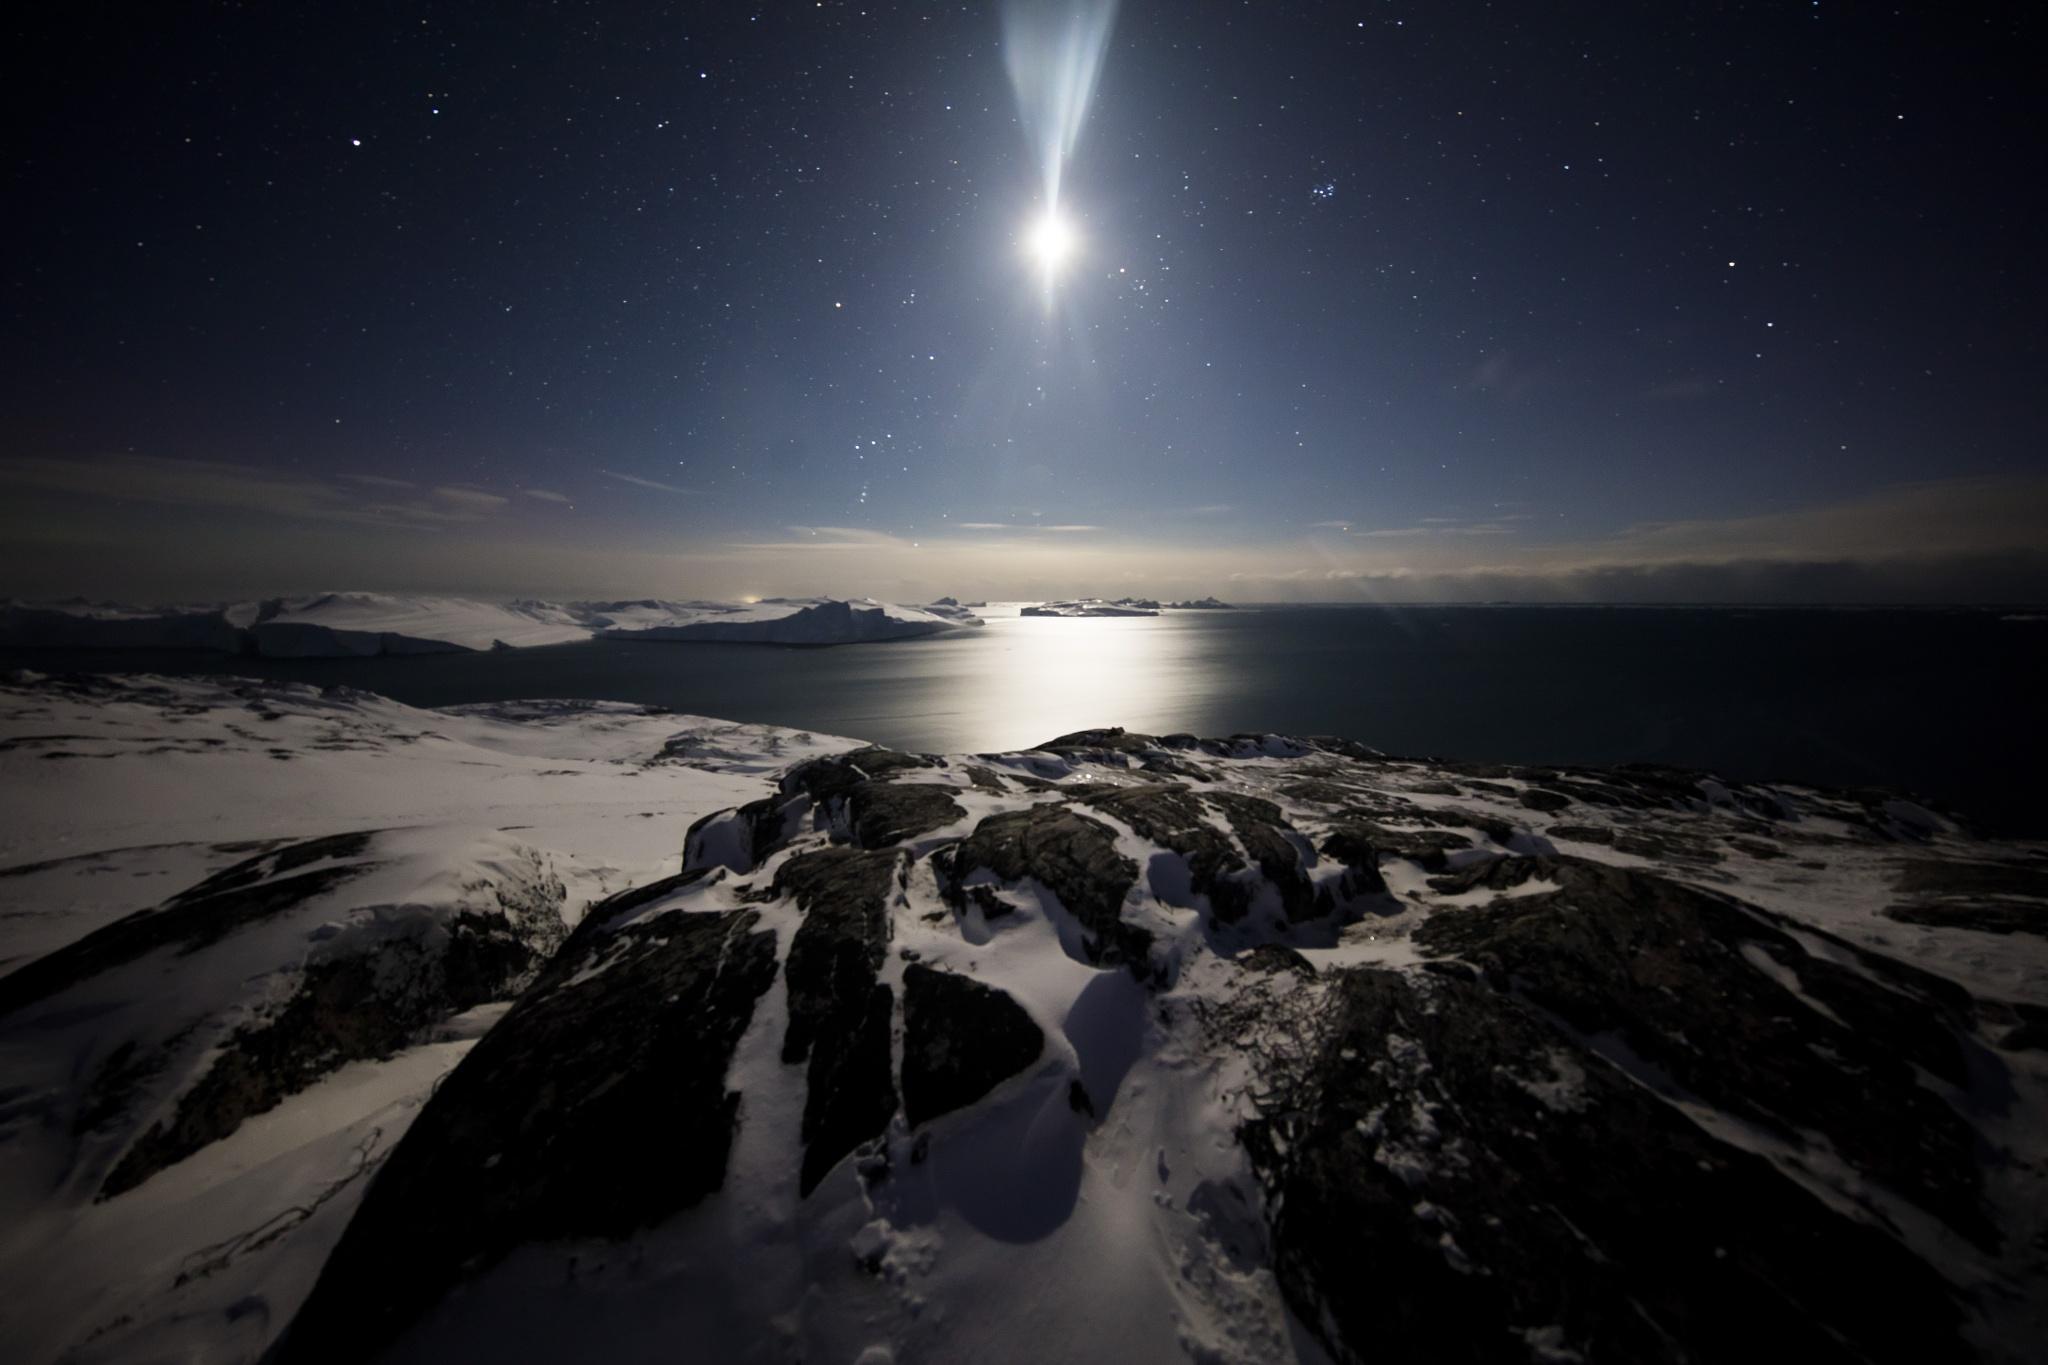 Moonlight over icefjord by sitanvansluis